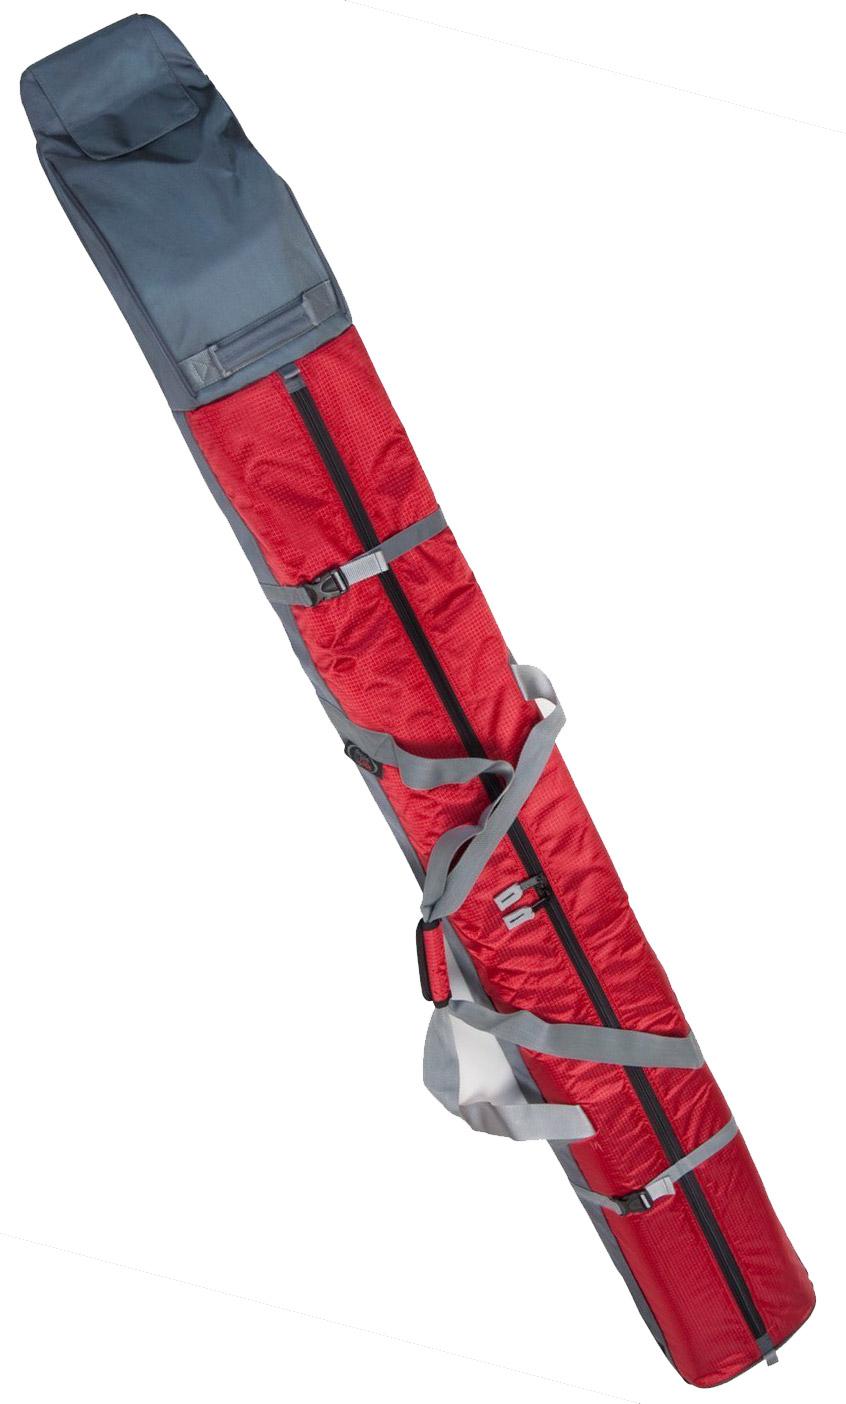 Select Sportbags Fully Padded Single Ski Bag W Wheels